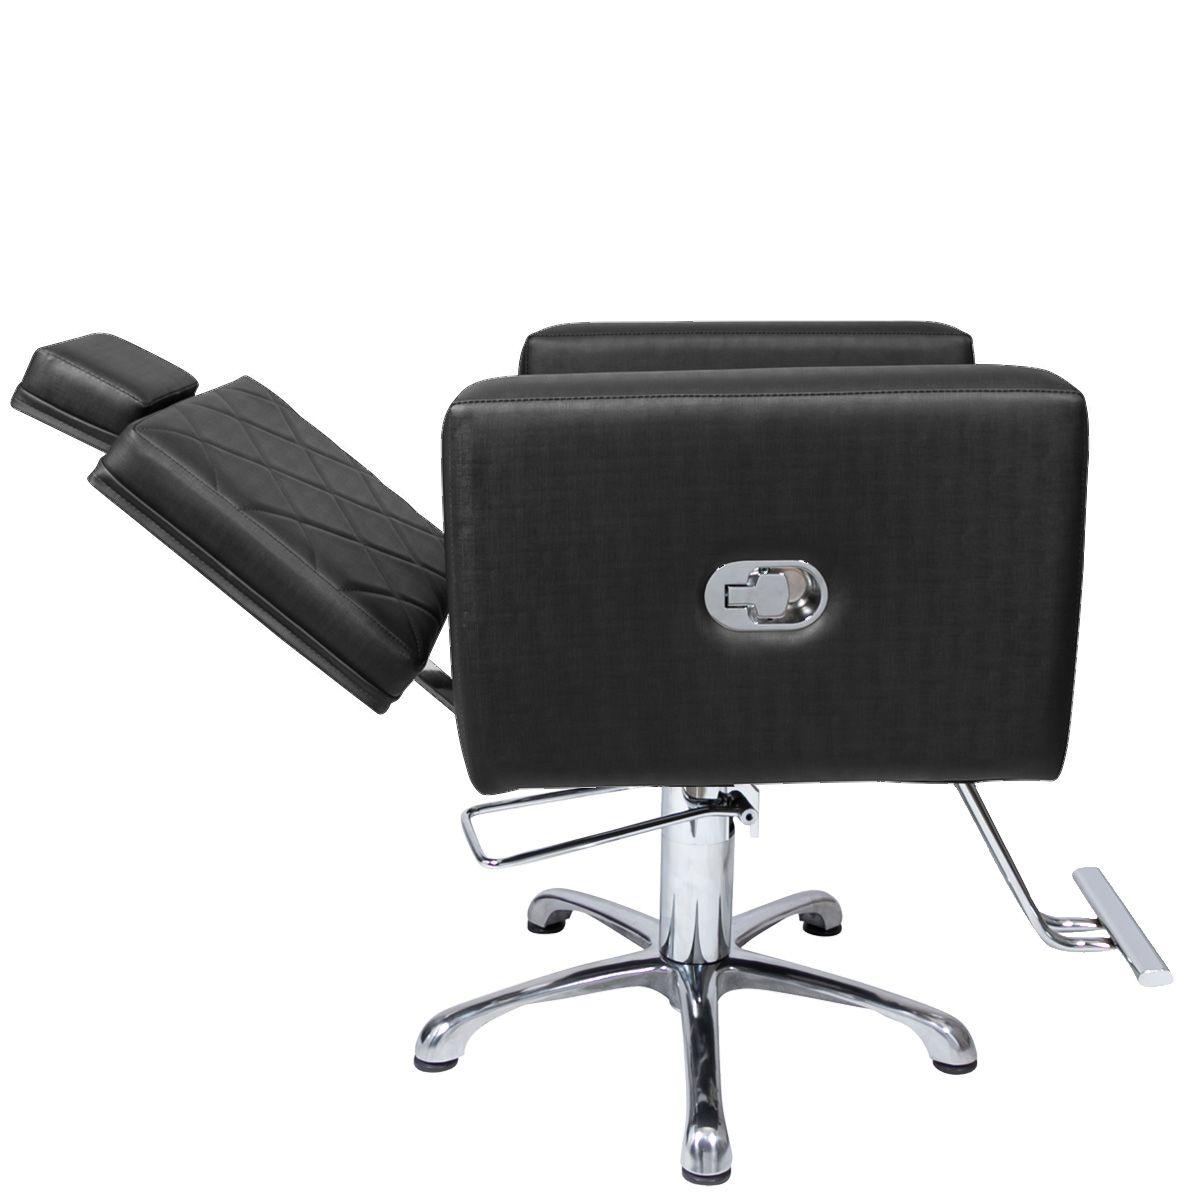 KIT Evidence -1 Cadeira Reclinável + 1 Lavatório